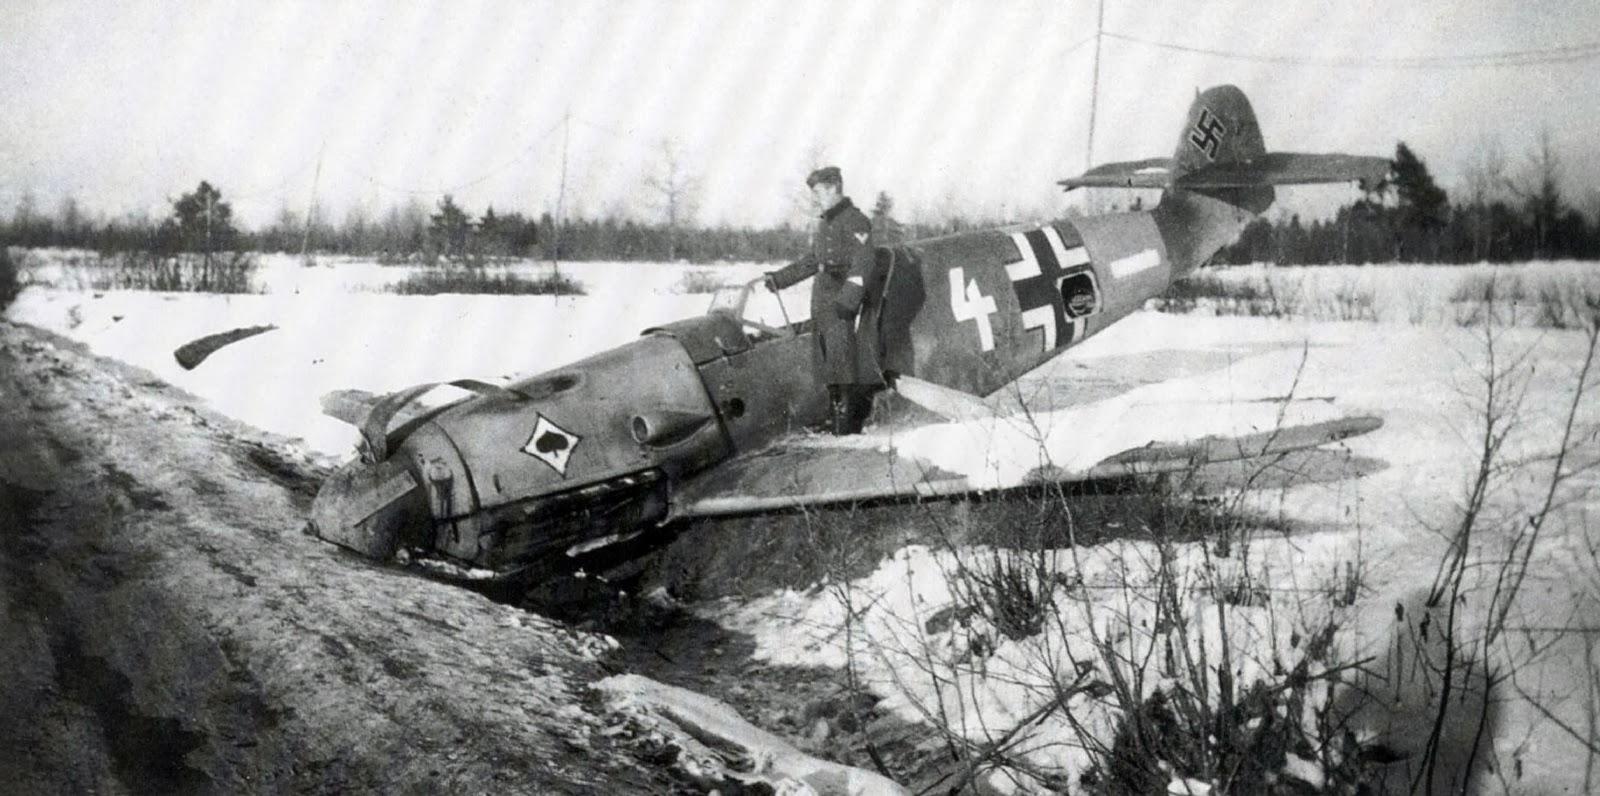 World War II Pictures In Details: Messerschmitt Bf 109 F-4 ...